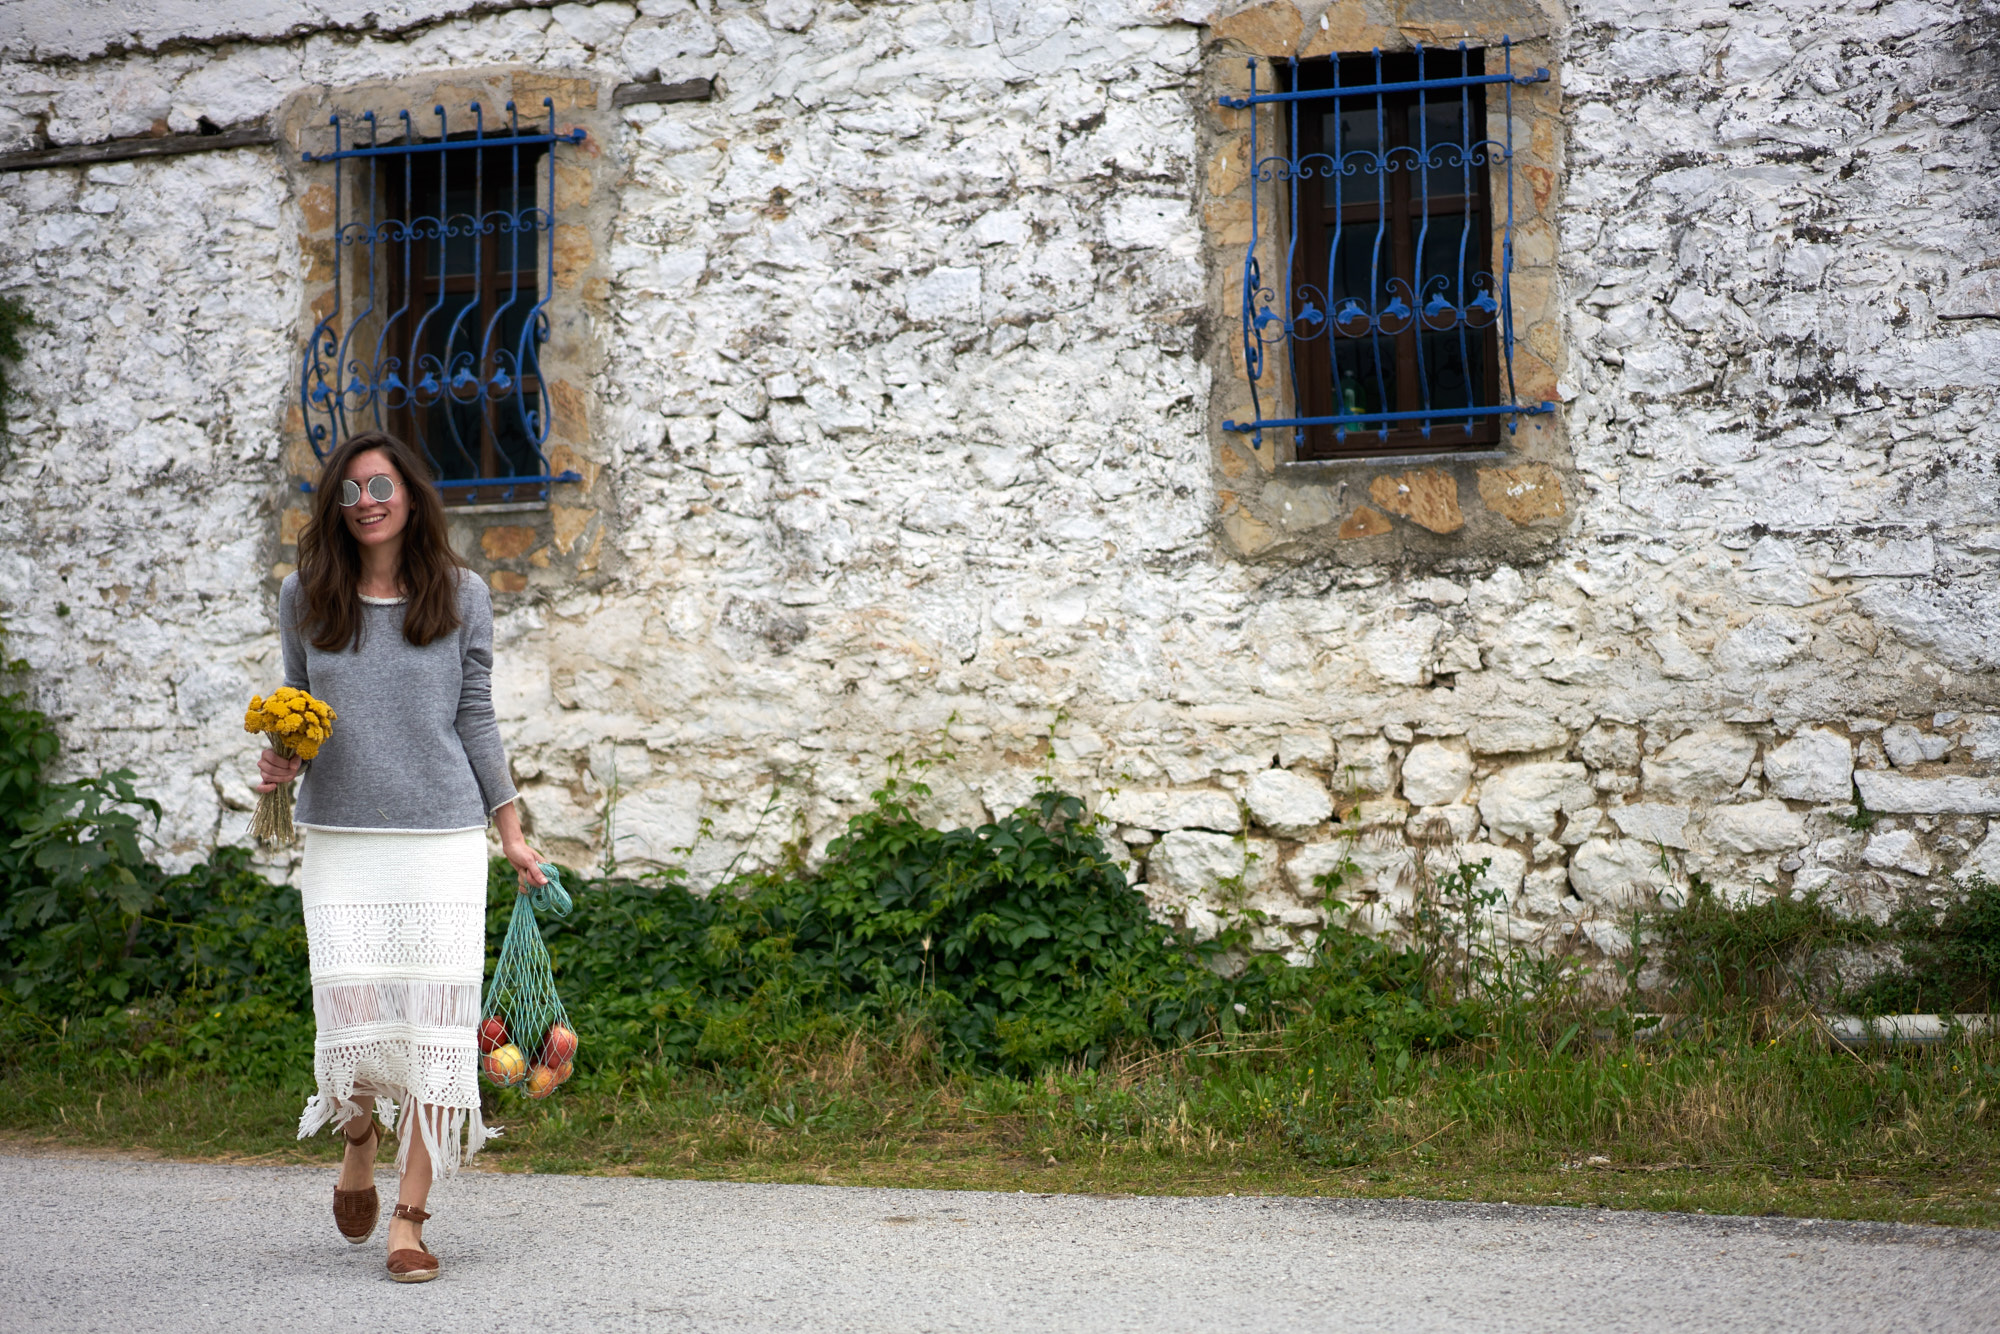 billur saatci, offnegiysem, street style, turkish style blogger, akyaka,